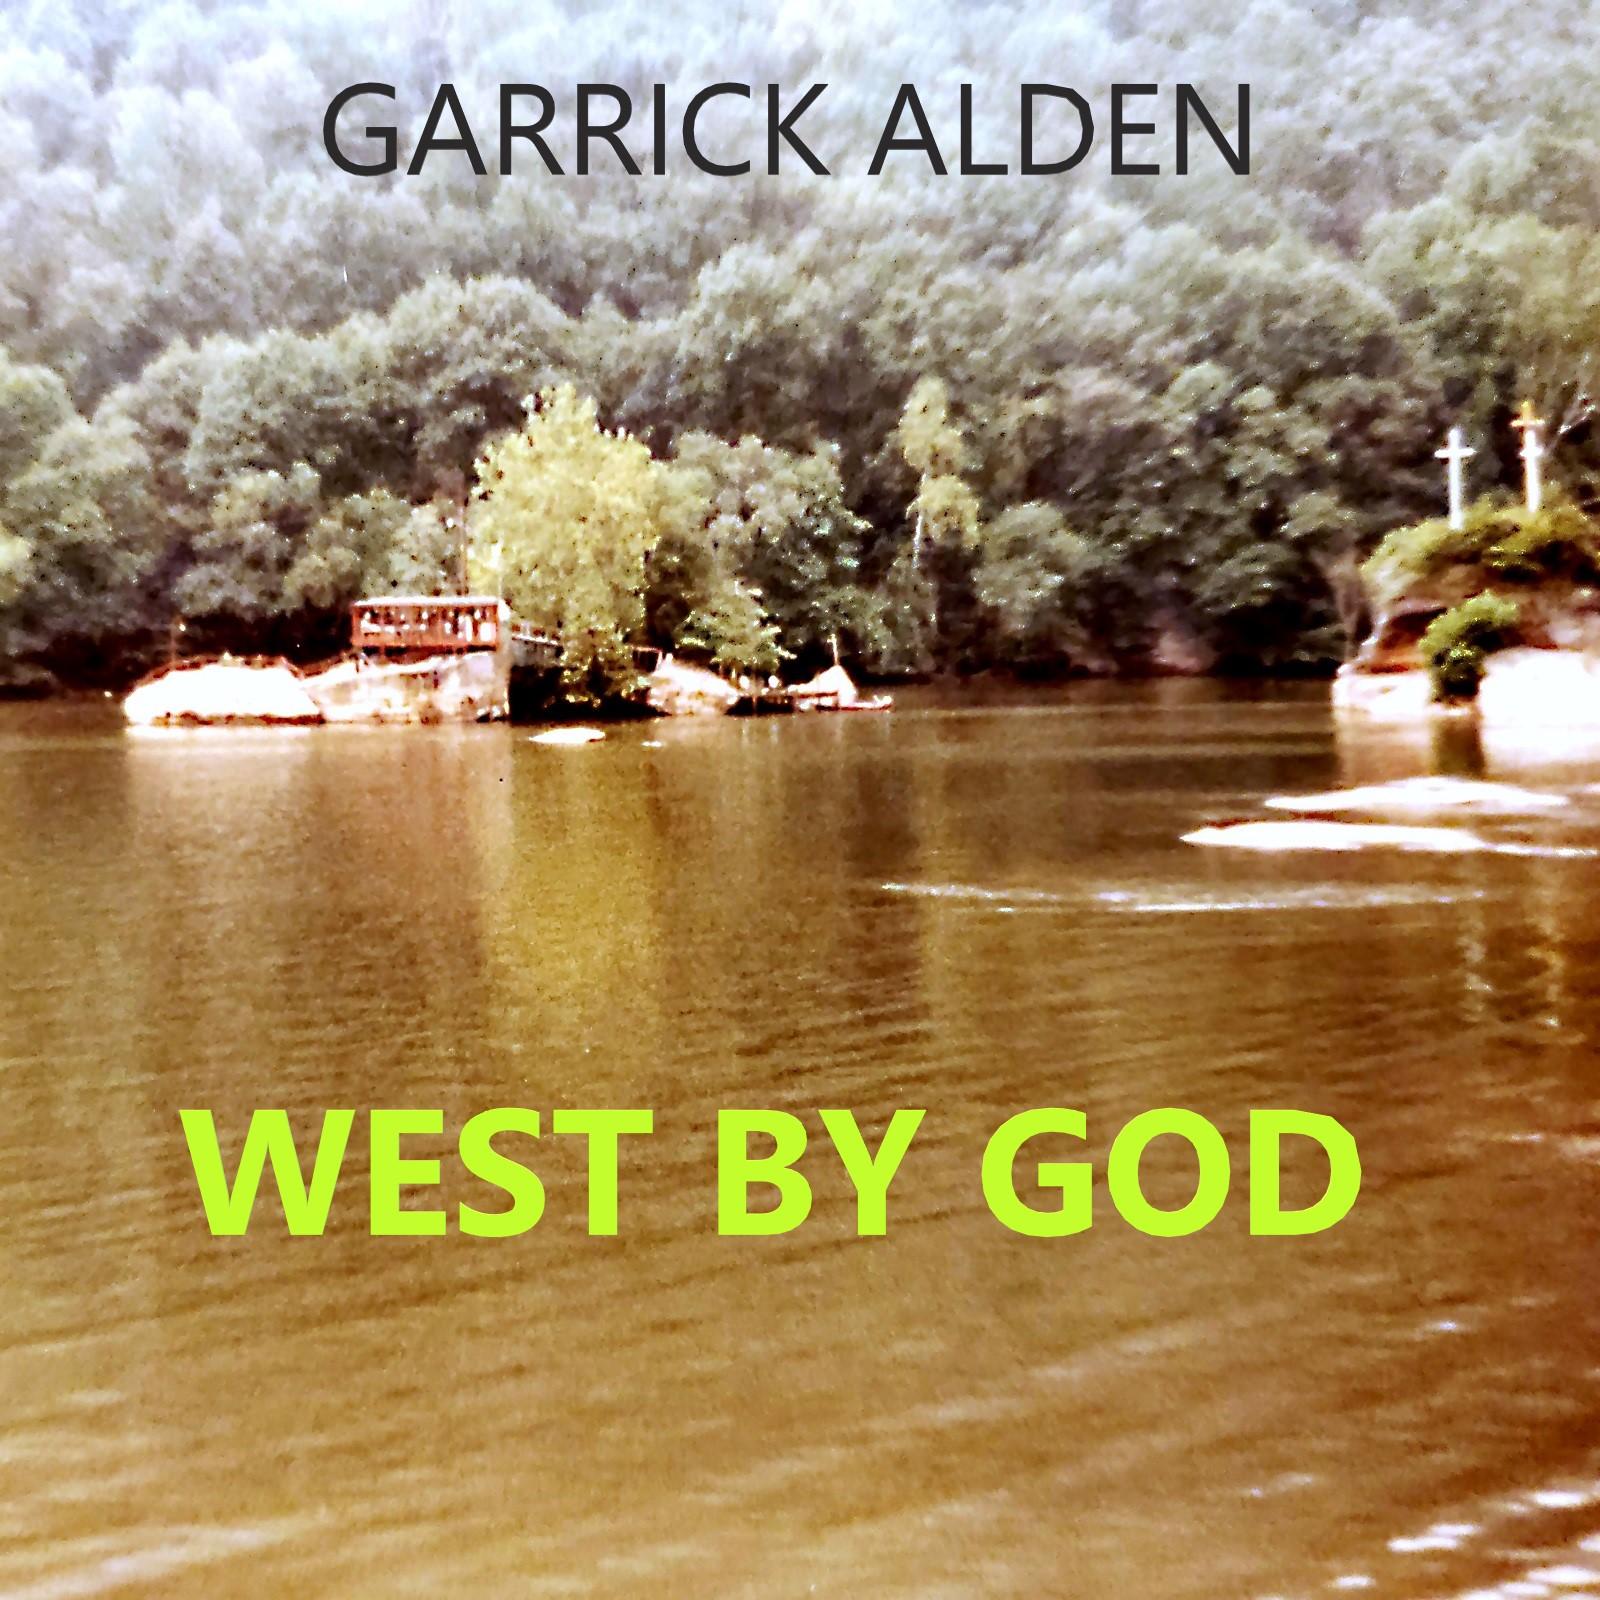 Garrick Alden